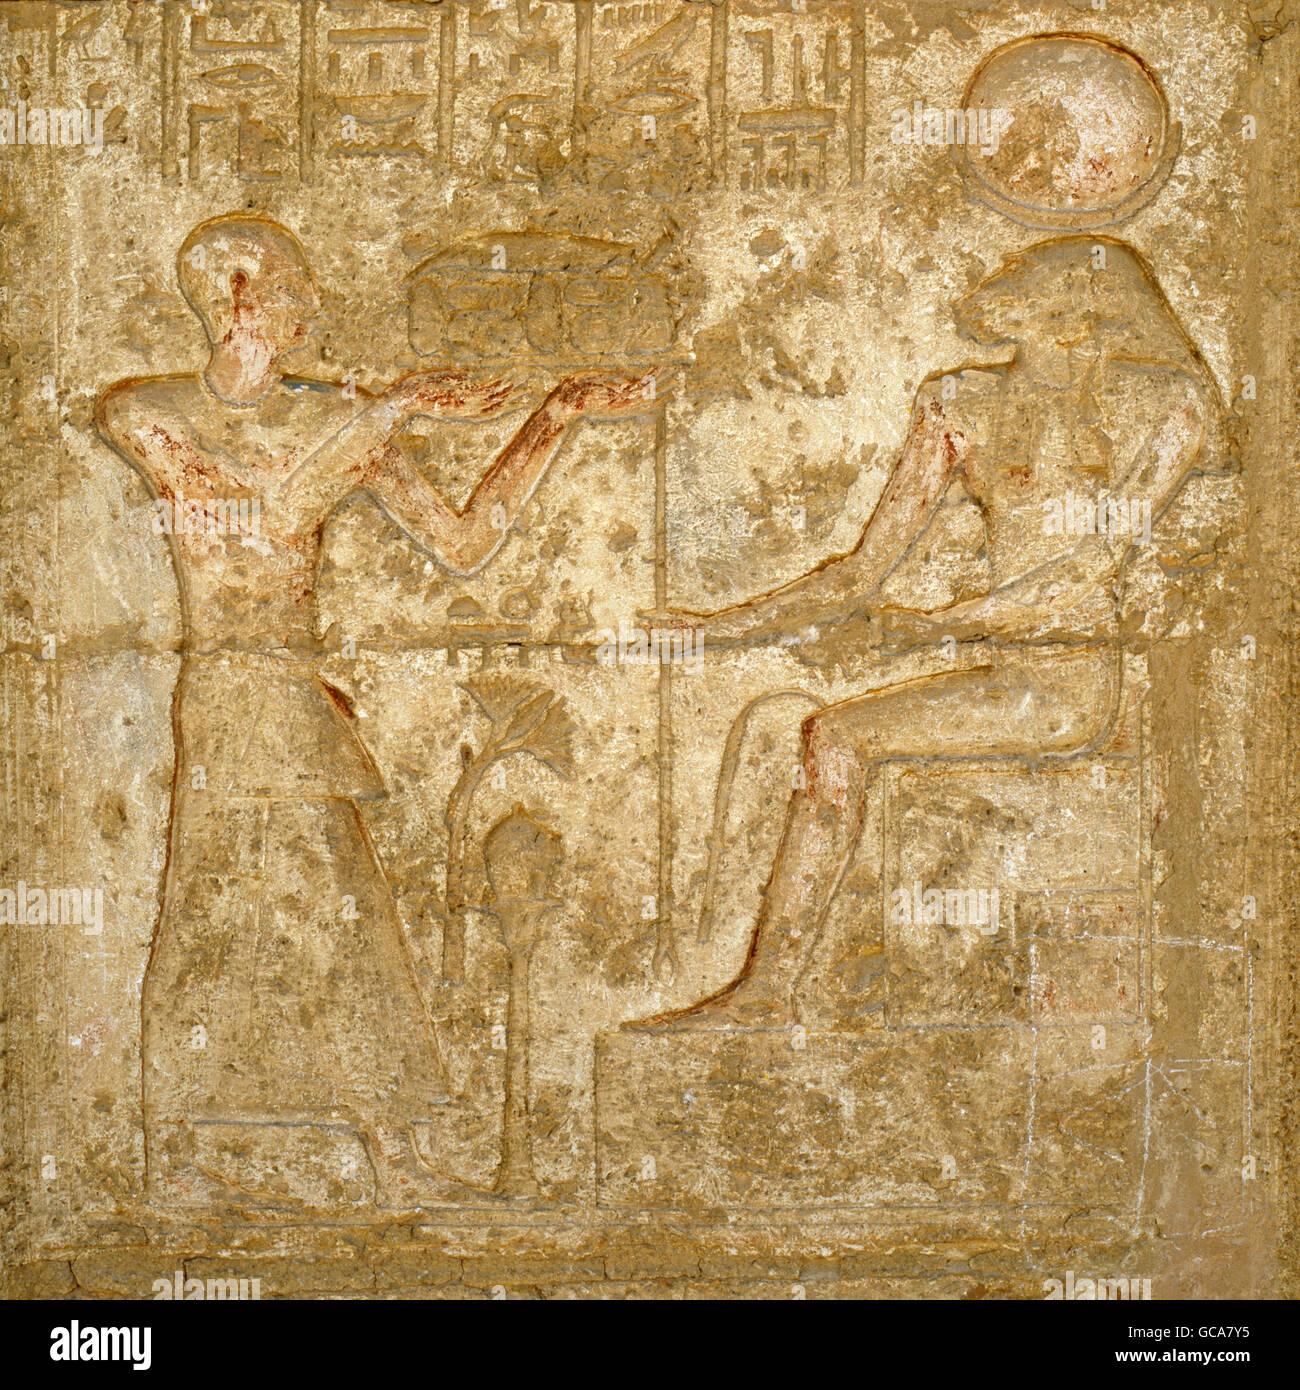 Bildende Kunst, antike, Ägypten, Tuna el-Gebel, Relief am Grab Tempel des Petosiris, Hohepriester des Thot, Stockbild